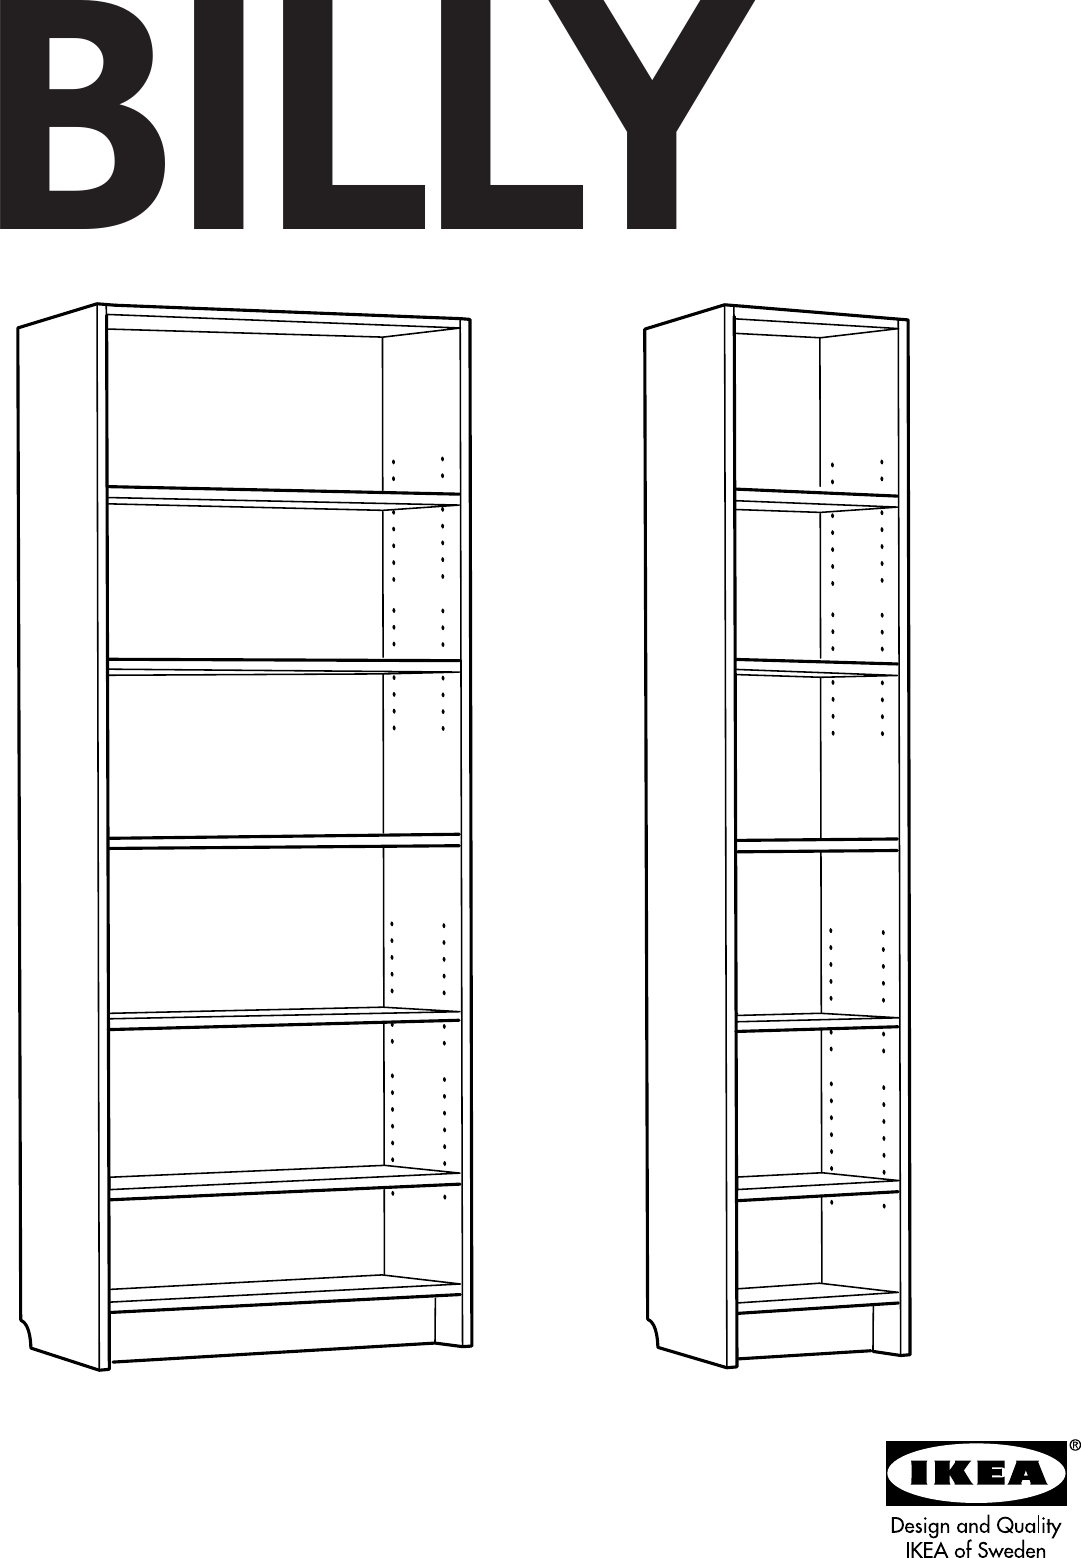 Ikea Billy Bookcase 80 Tall Assembly Instruction